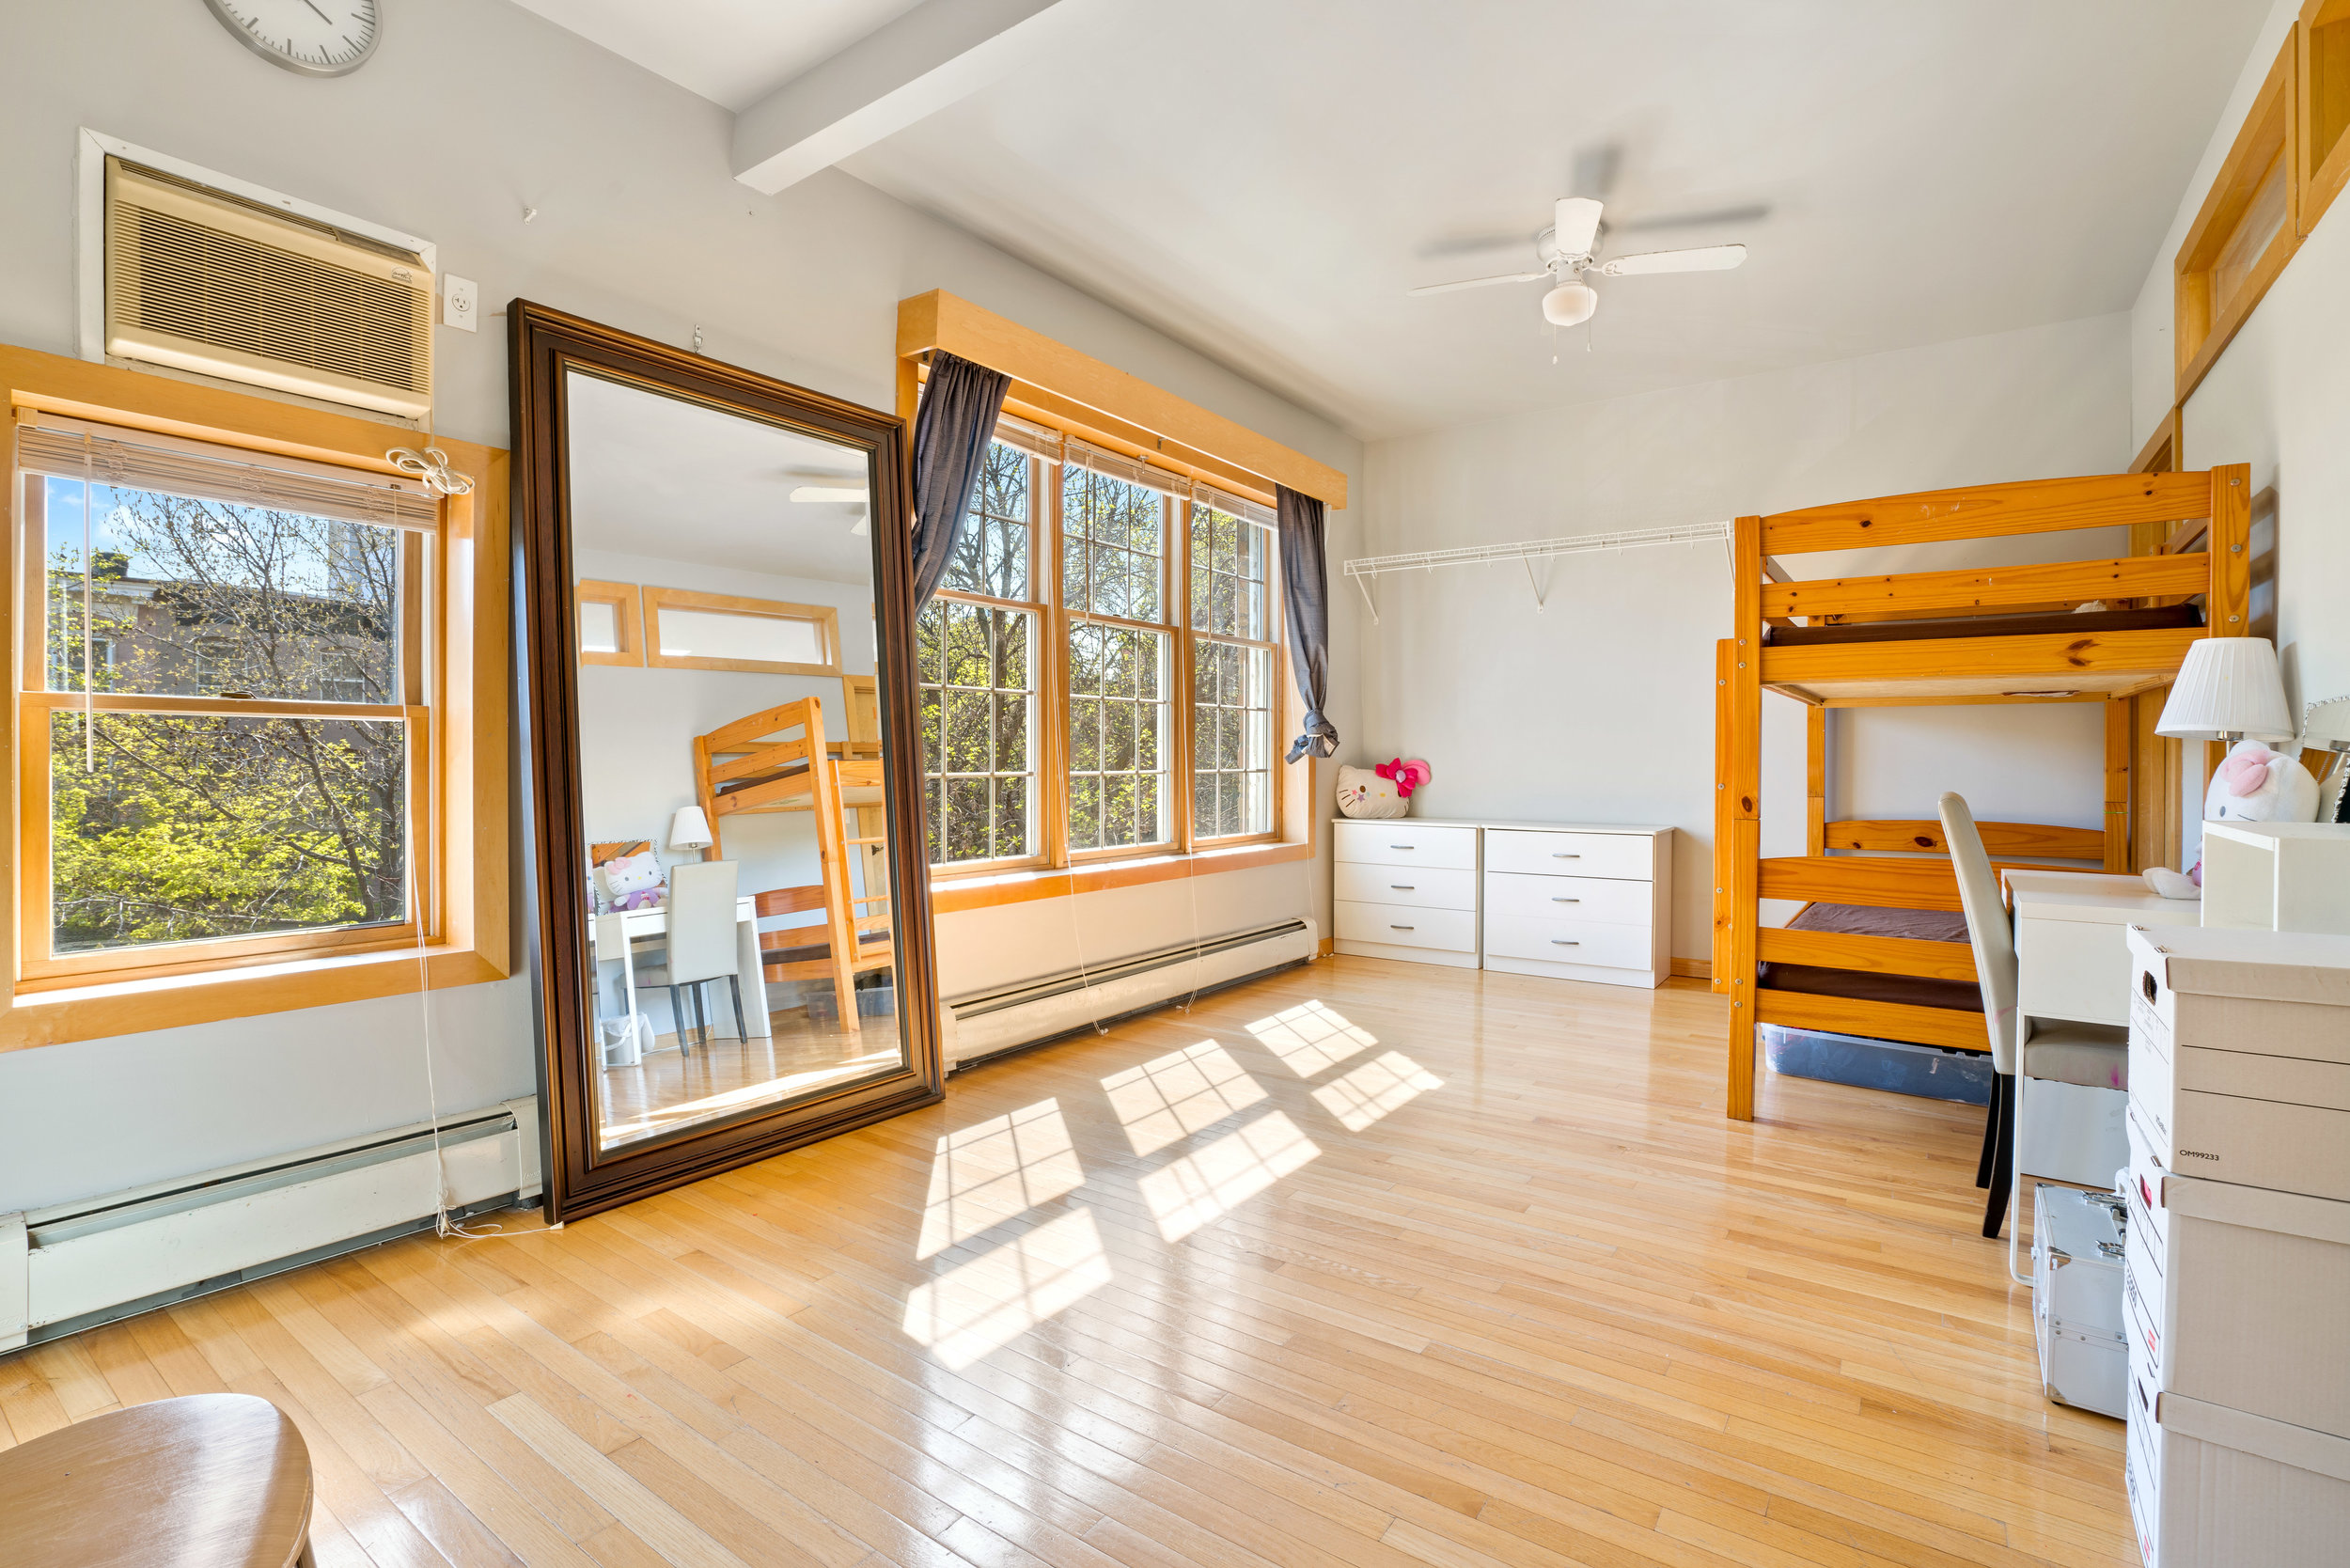 641 Warren St Explore This Japanese Inspired Townhouse In Brooklyn's Park Slope Neighborhood Asking $2.995 Million